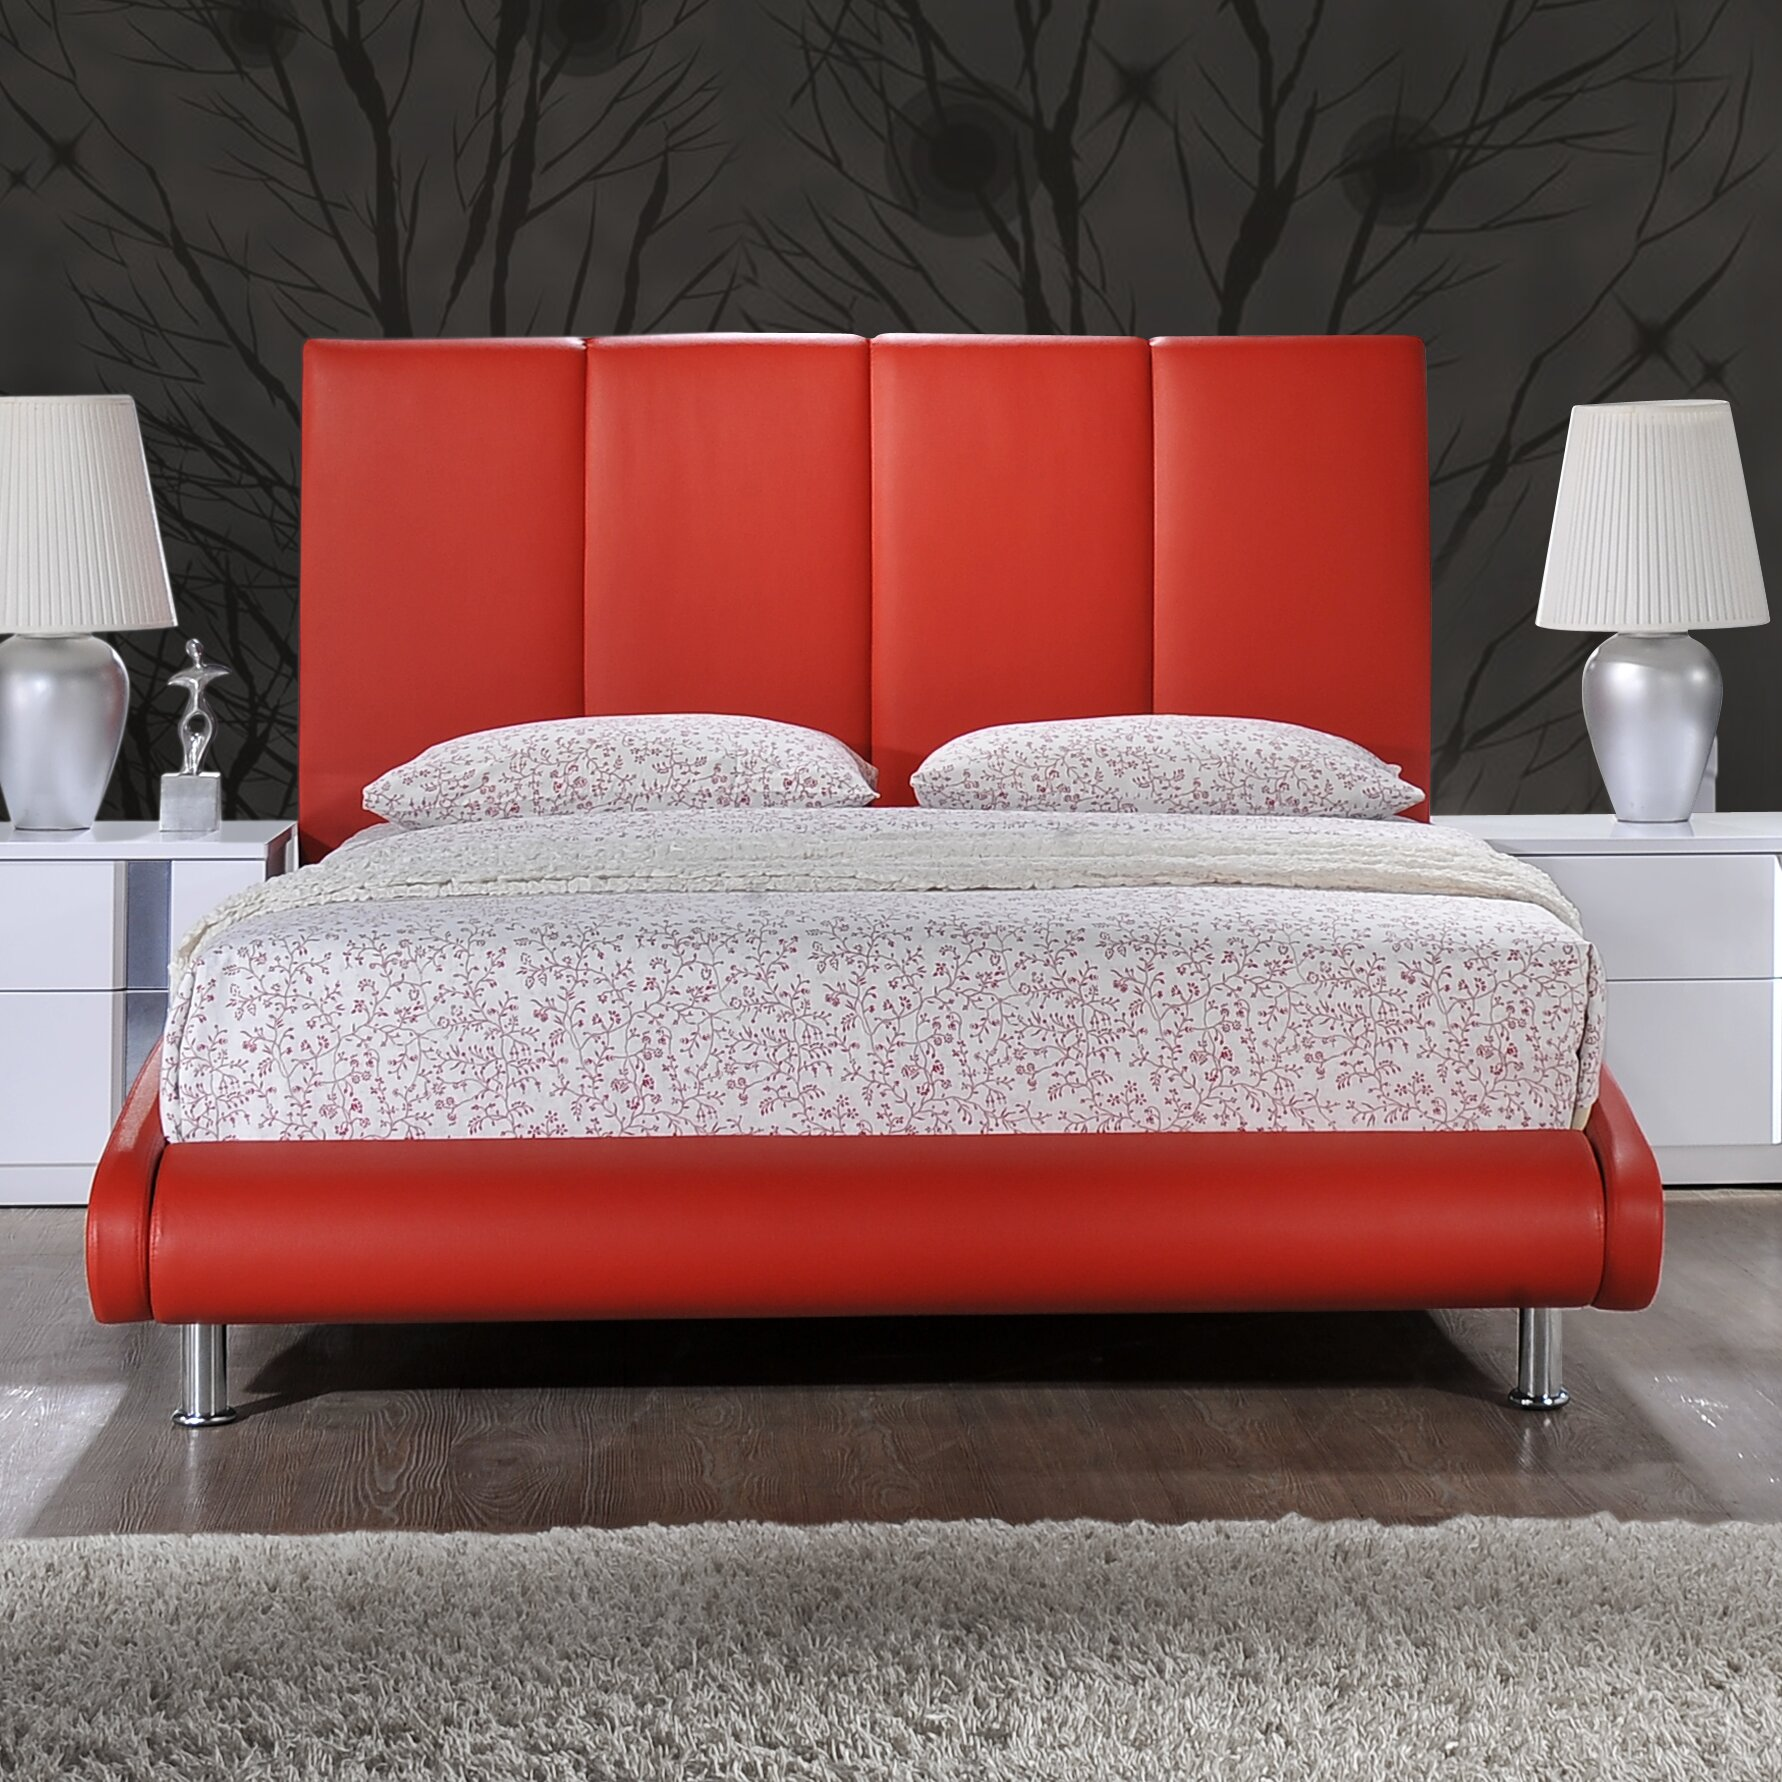 Global Furniture Usa Upholstered Sleigh Bed Reviews Wayfair